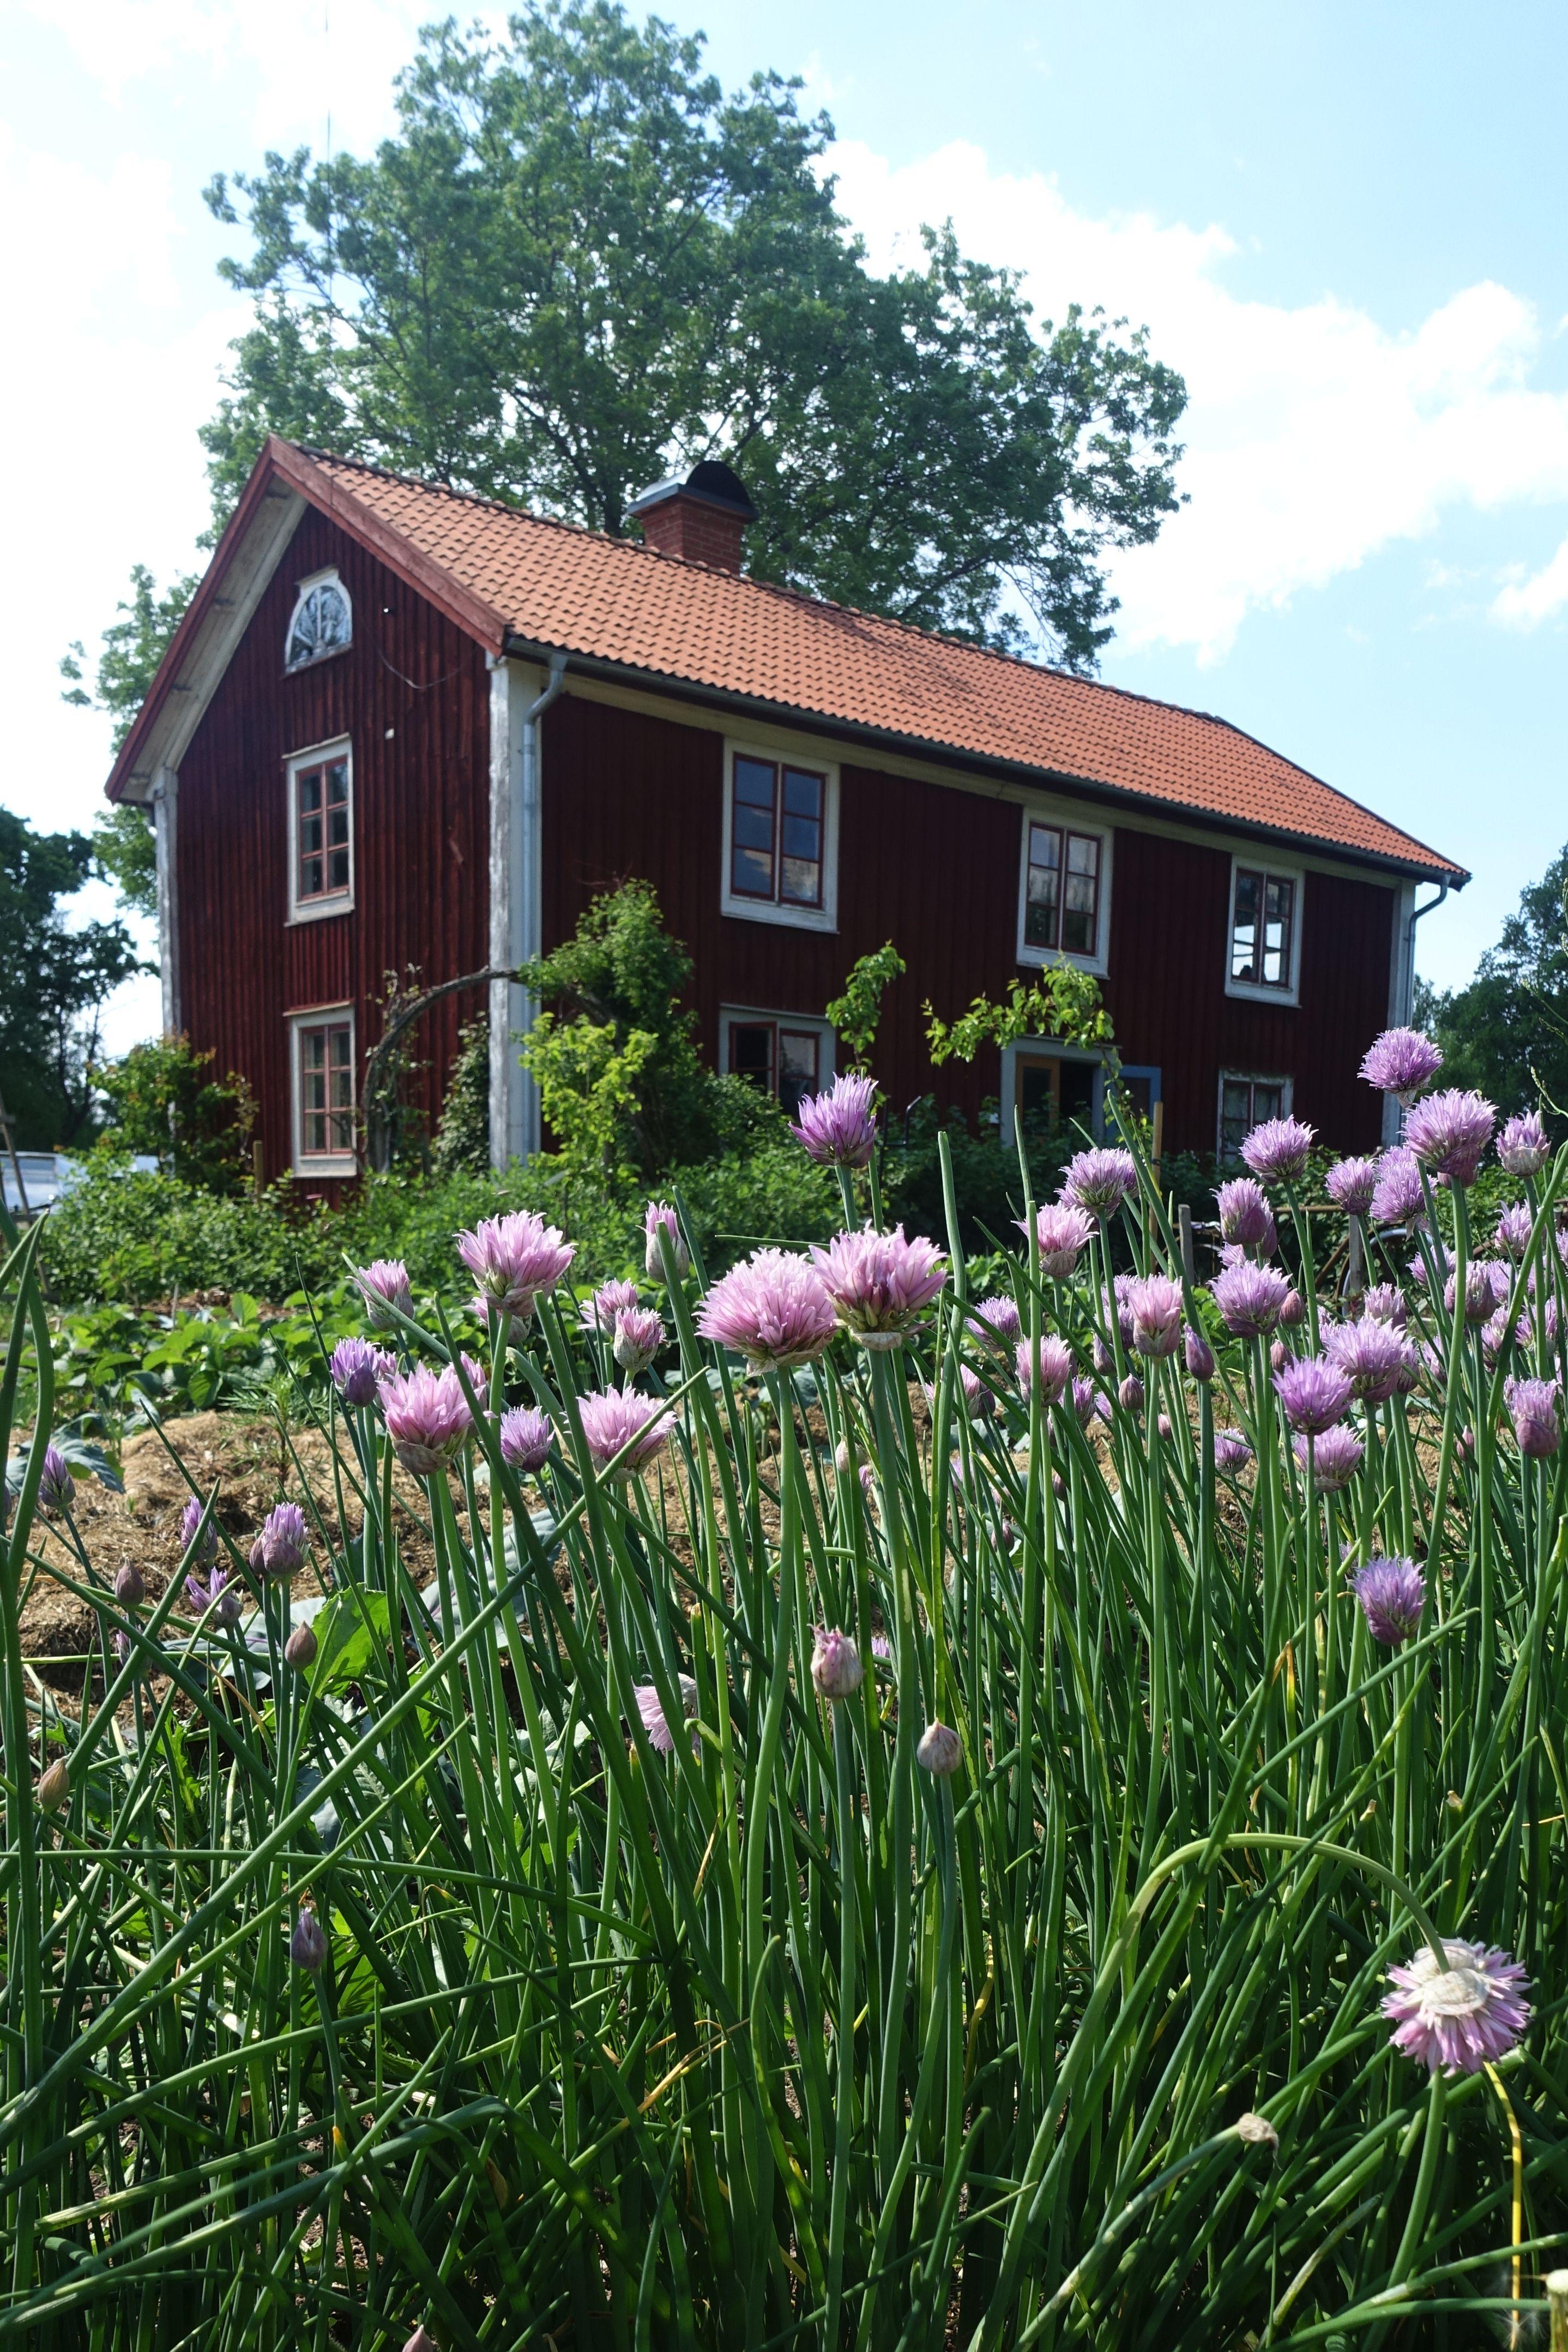 Bostadshuset skymtar i bakgrunden bakom höga blommande gräslöksplantor. My house, just behind my chives.